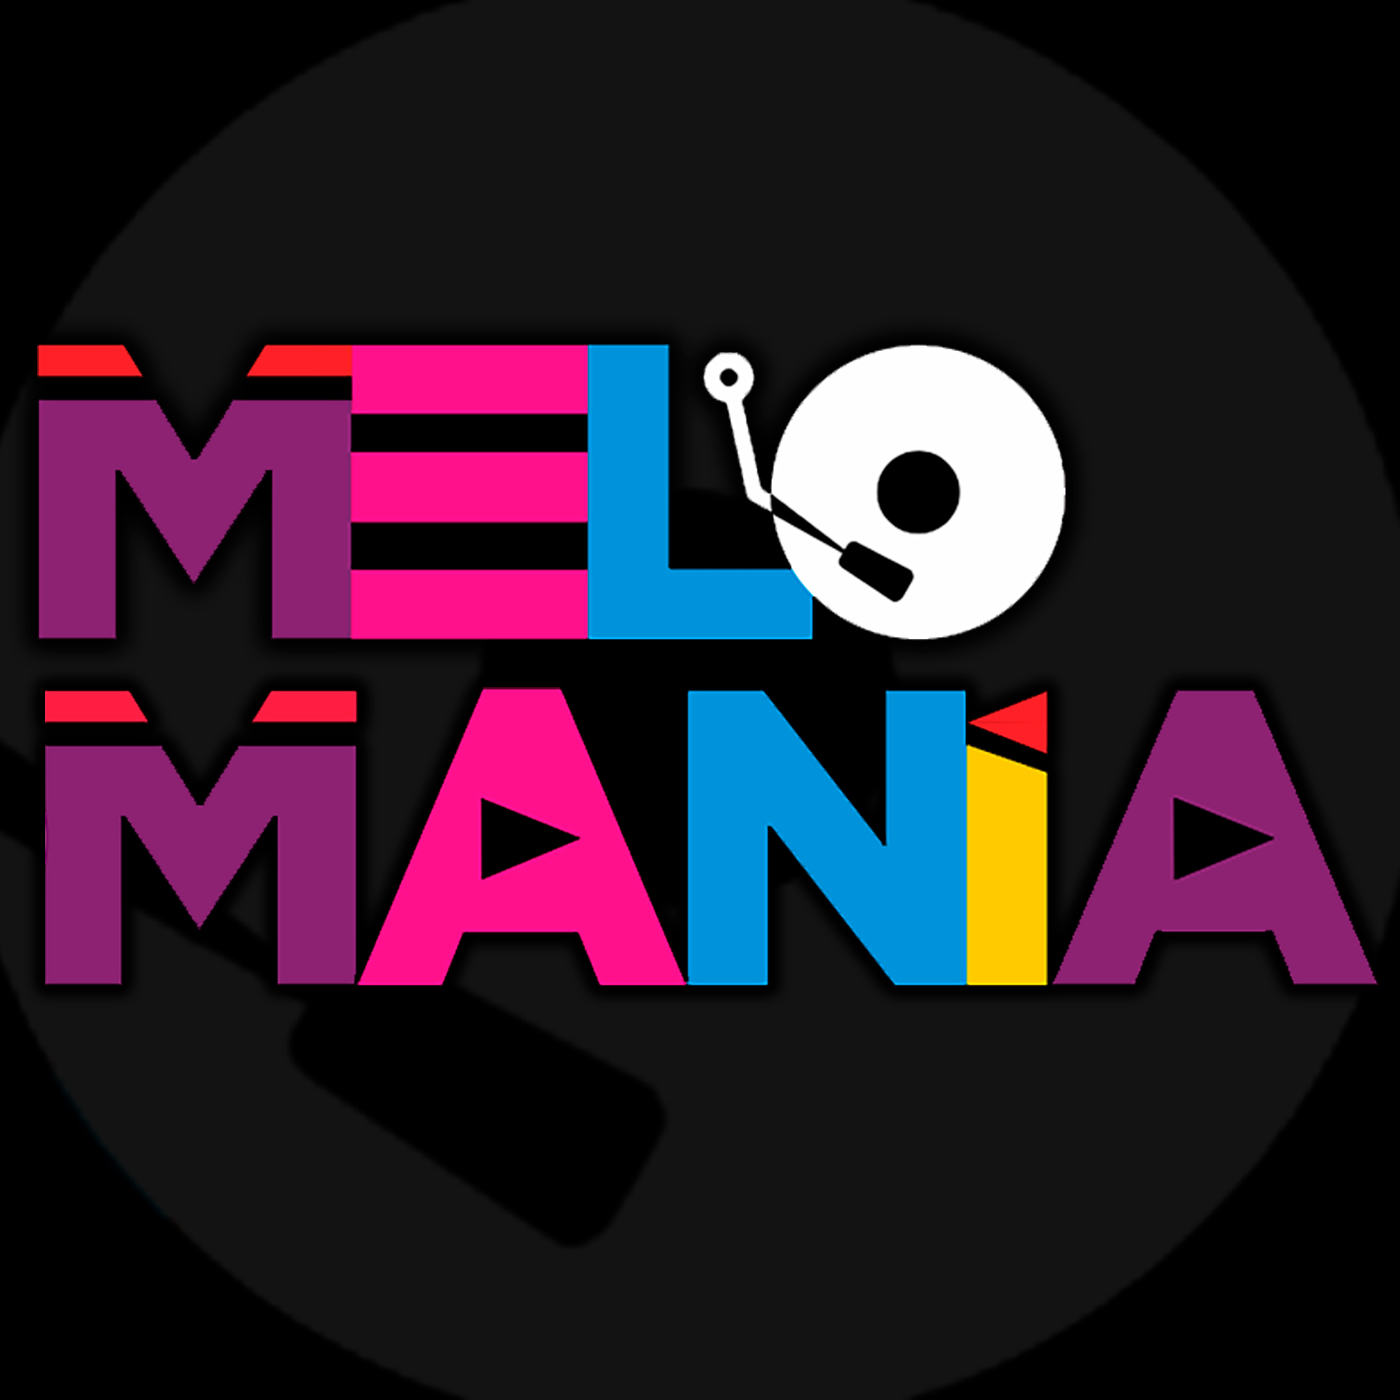 Artwork for podcast Melomanía